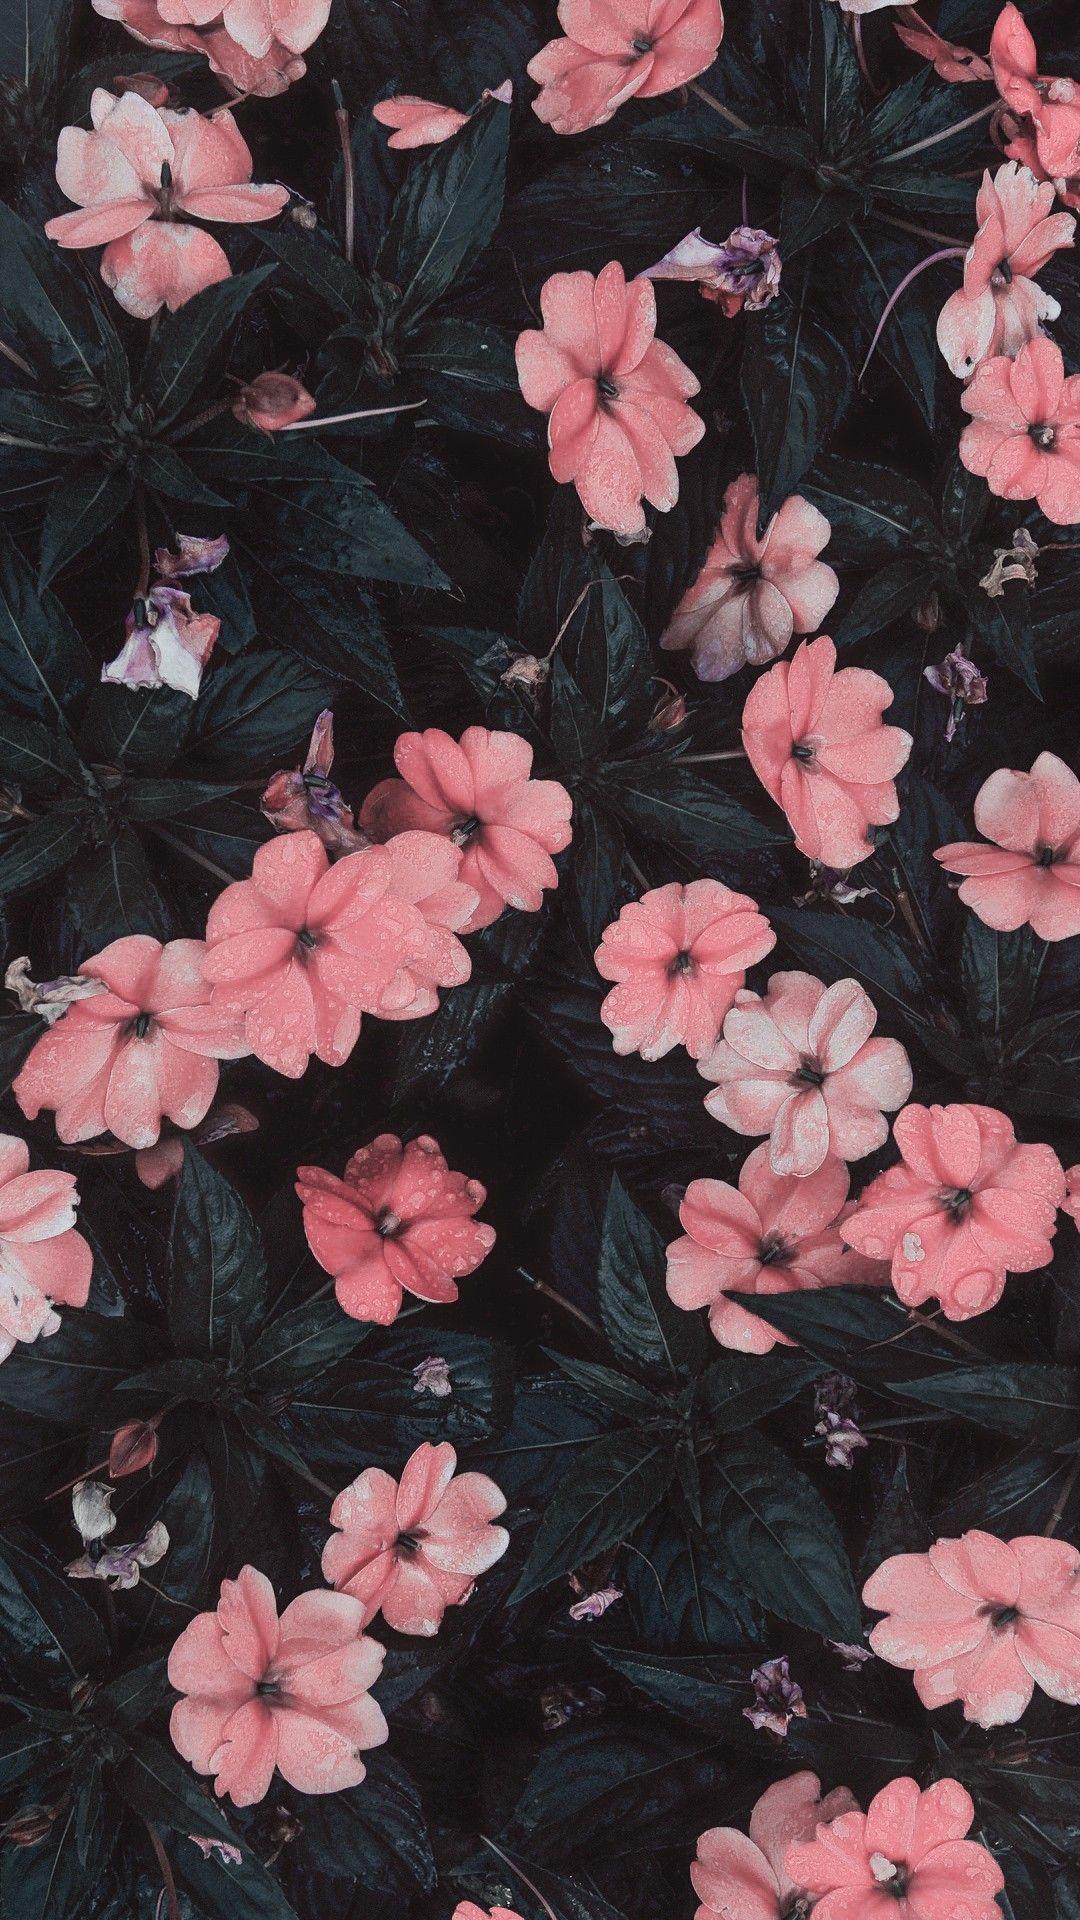 3d Wall Wallpapers Murals In 2020 Floral Wallpaper Phone Floral Wallpaper Iphone Flower Wallpaper